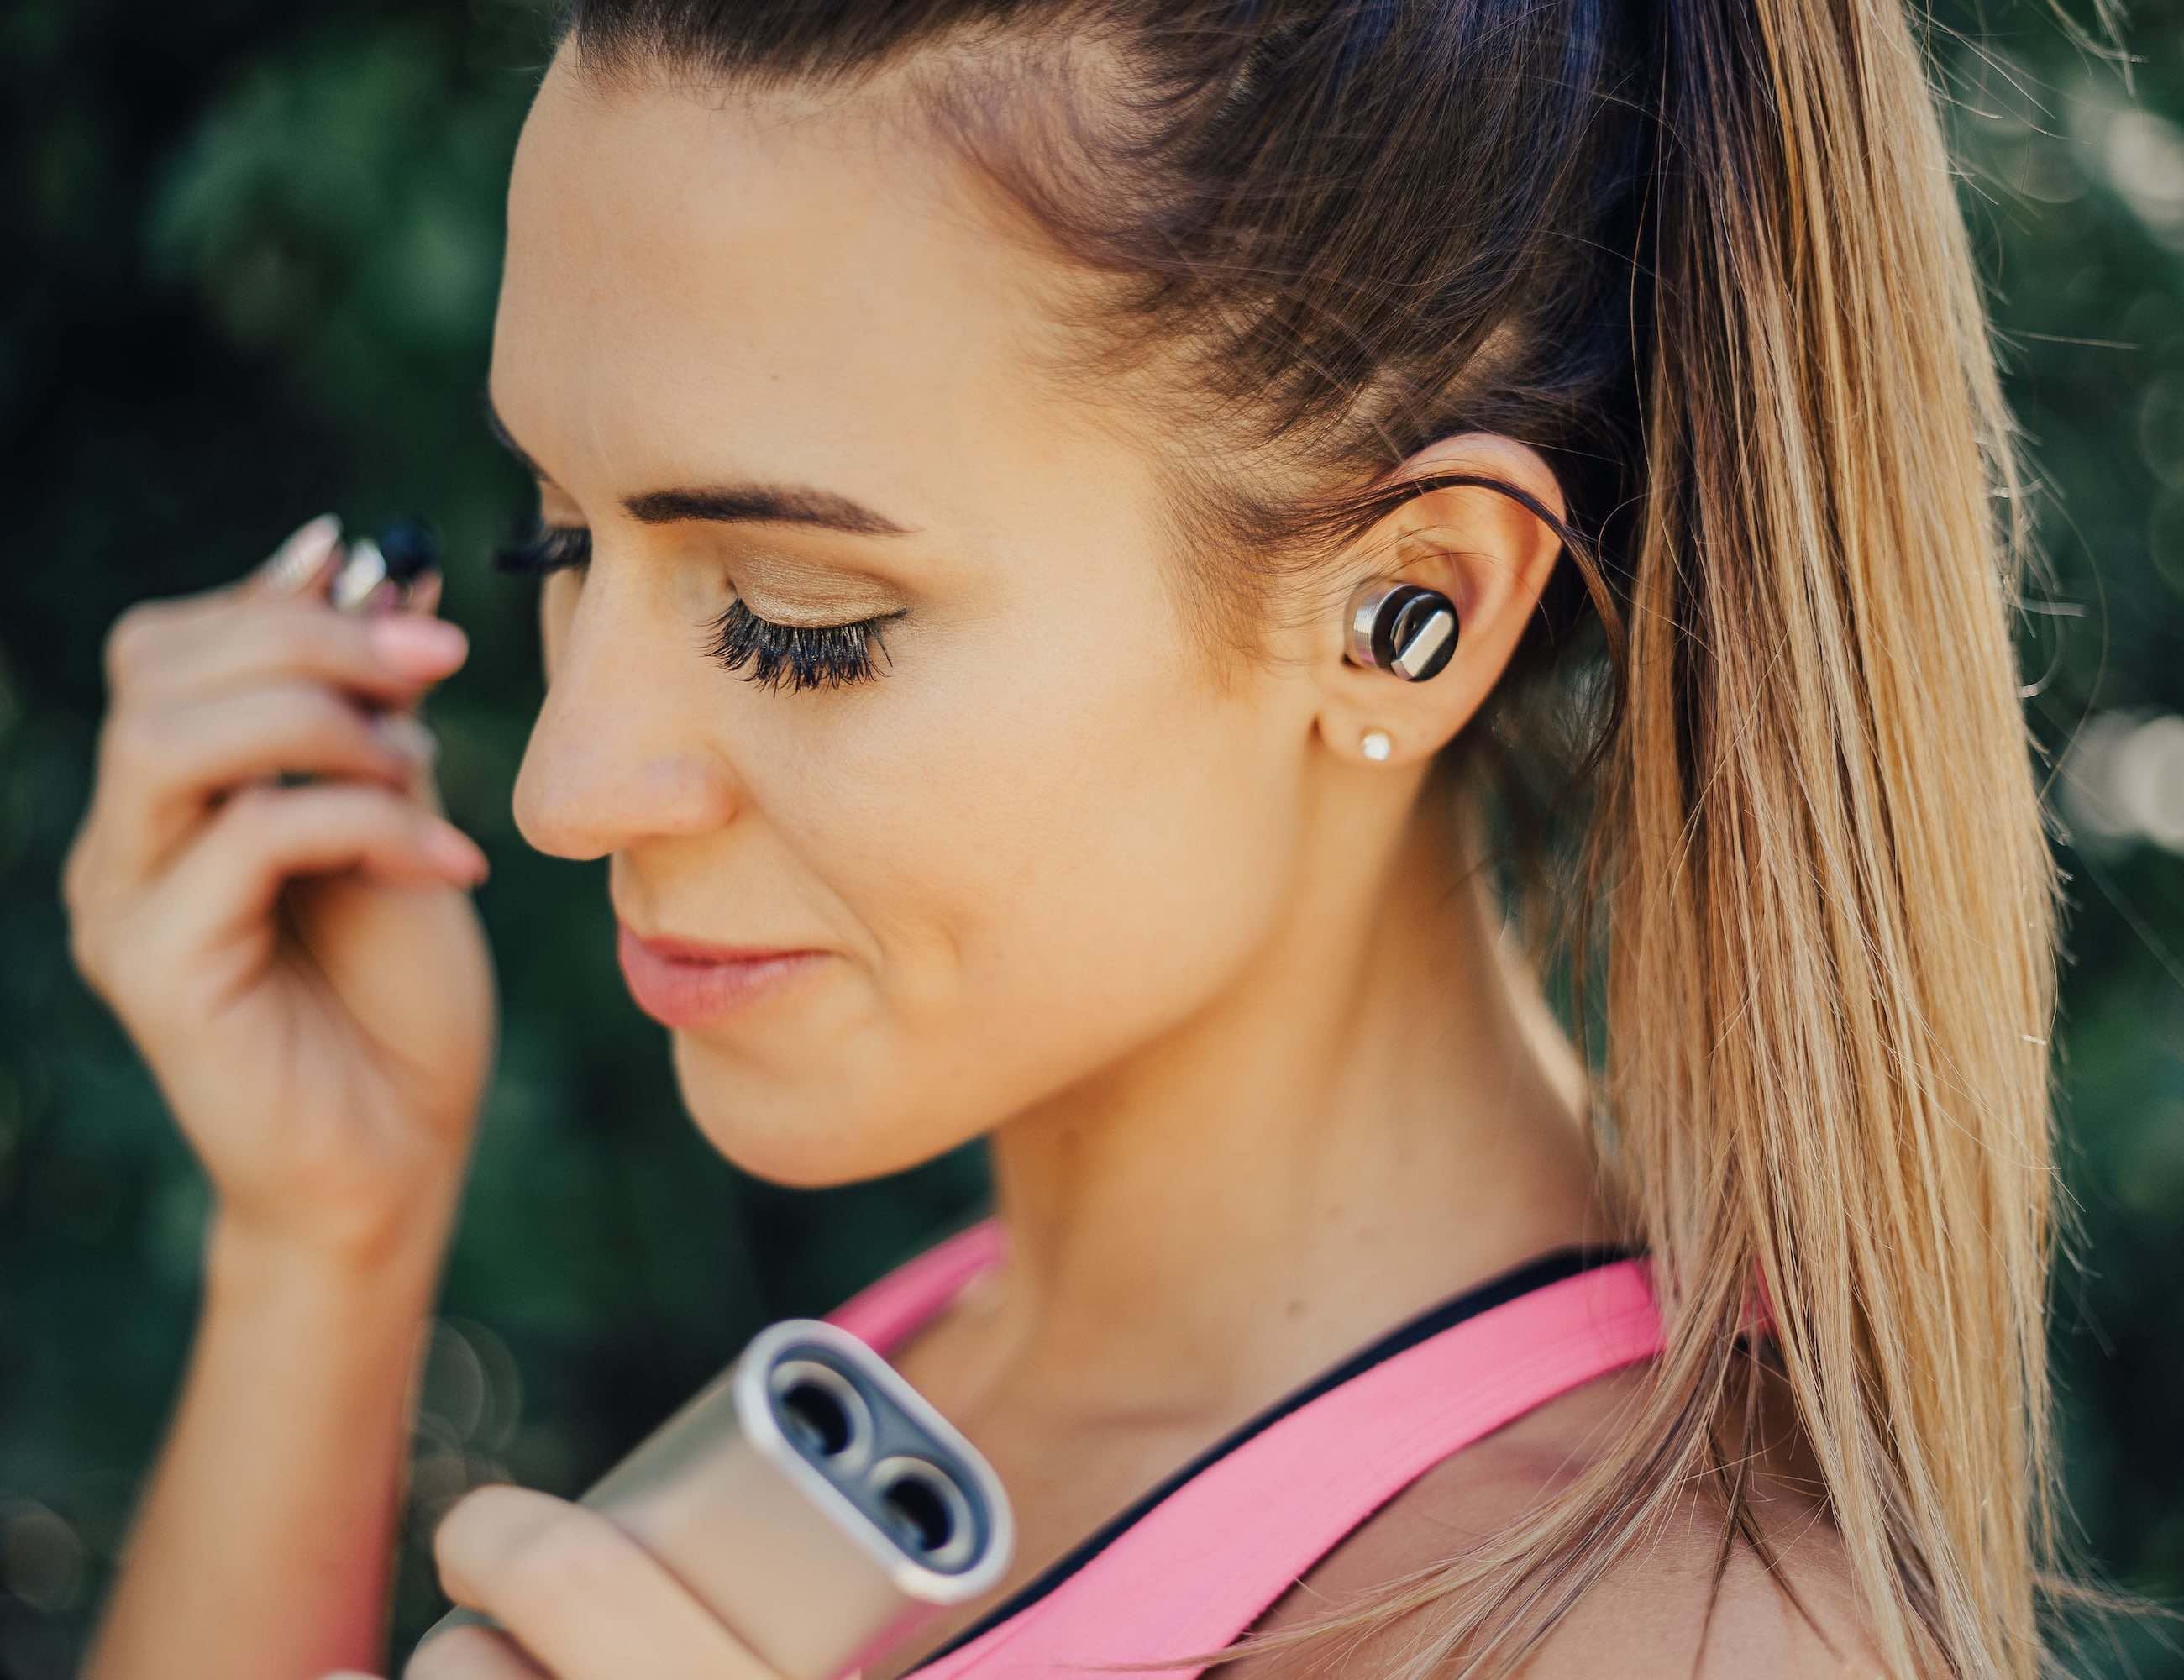 Schatzii Bullet 2.0 Wireless Stereo Earbuds